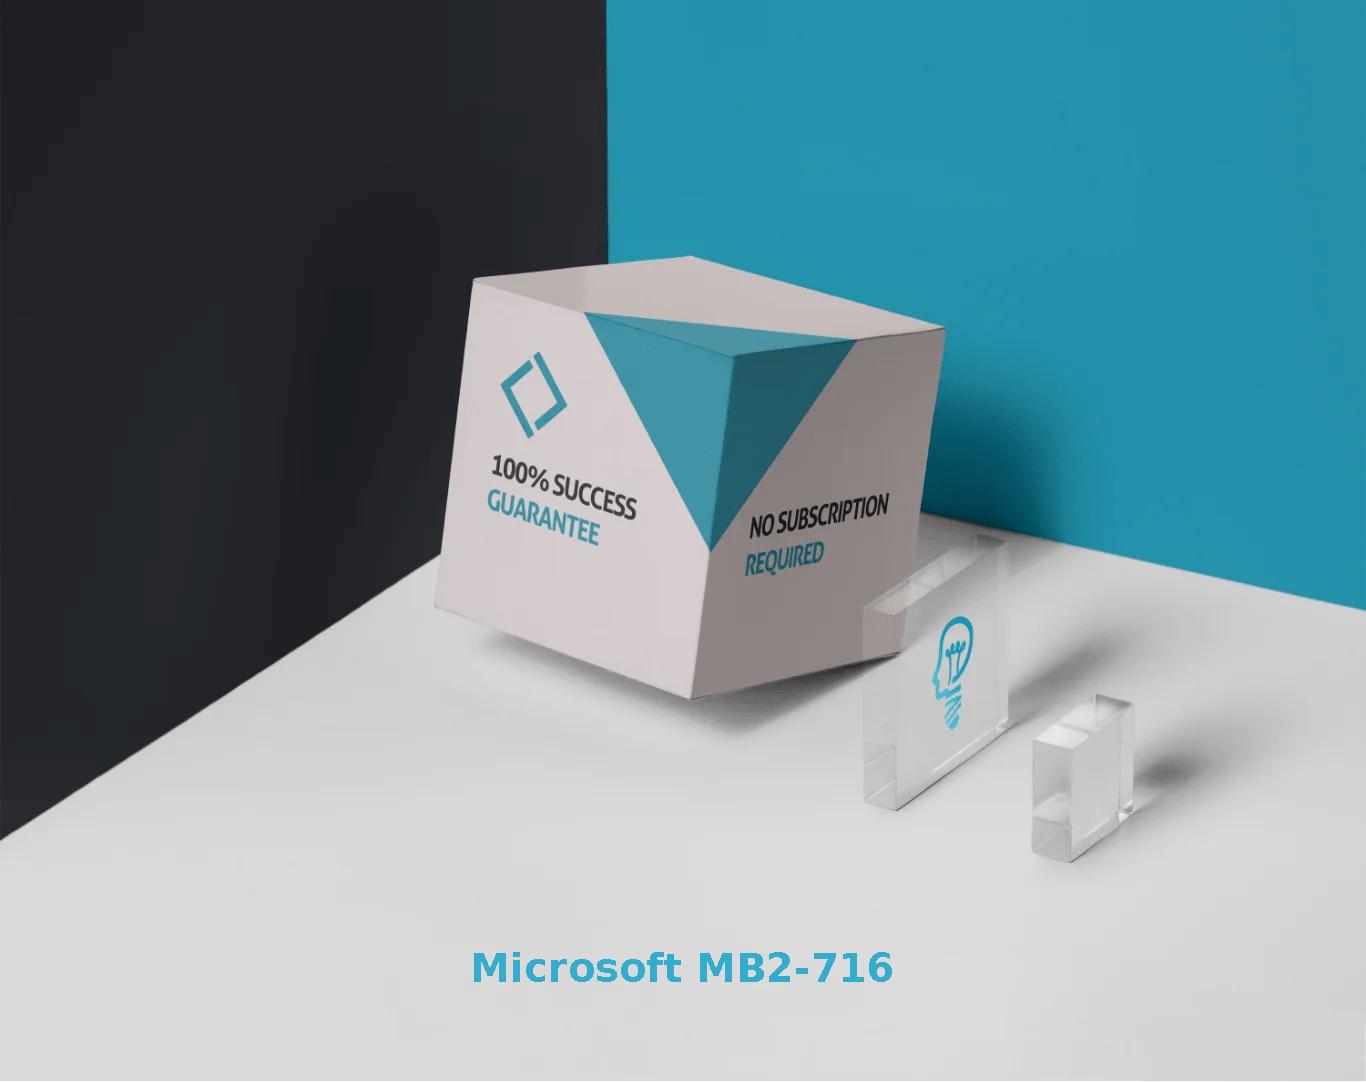 Microsoft MB2-716 Exams